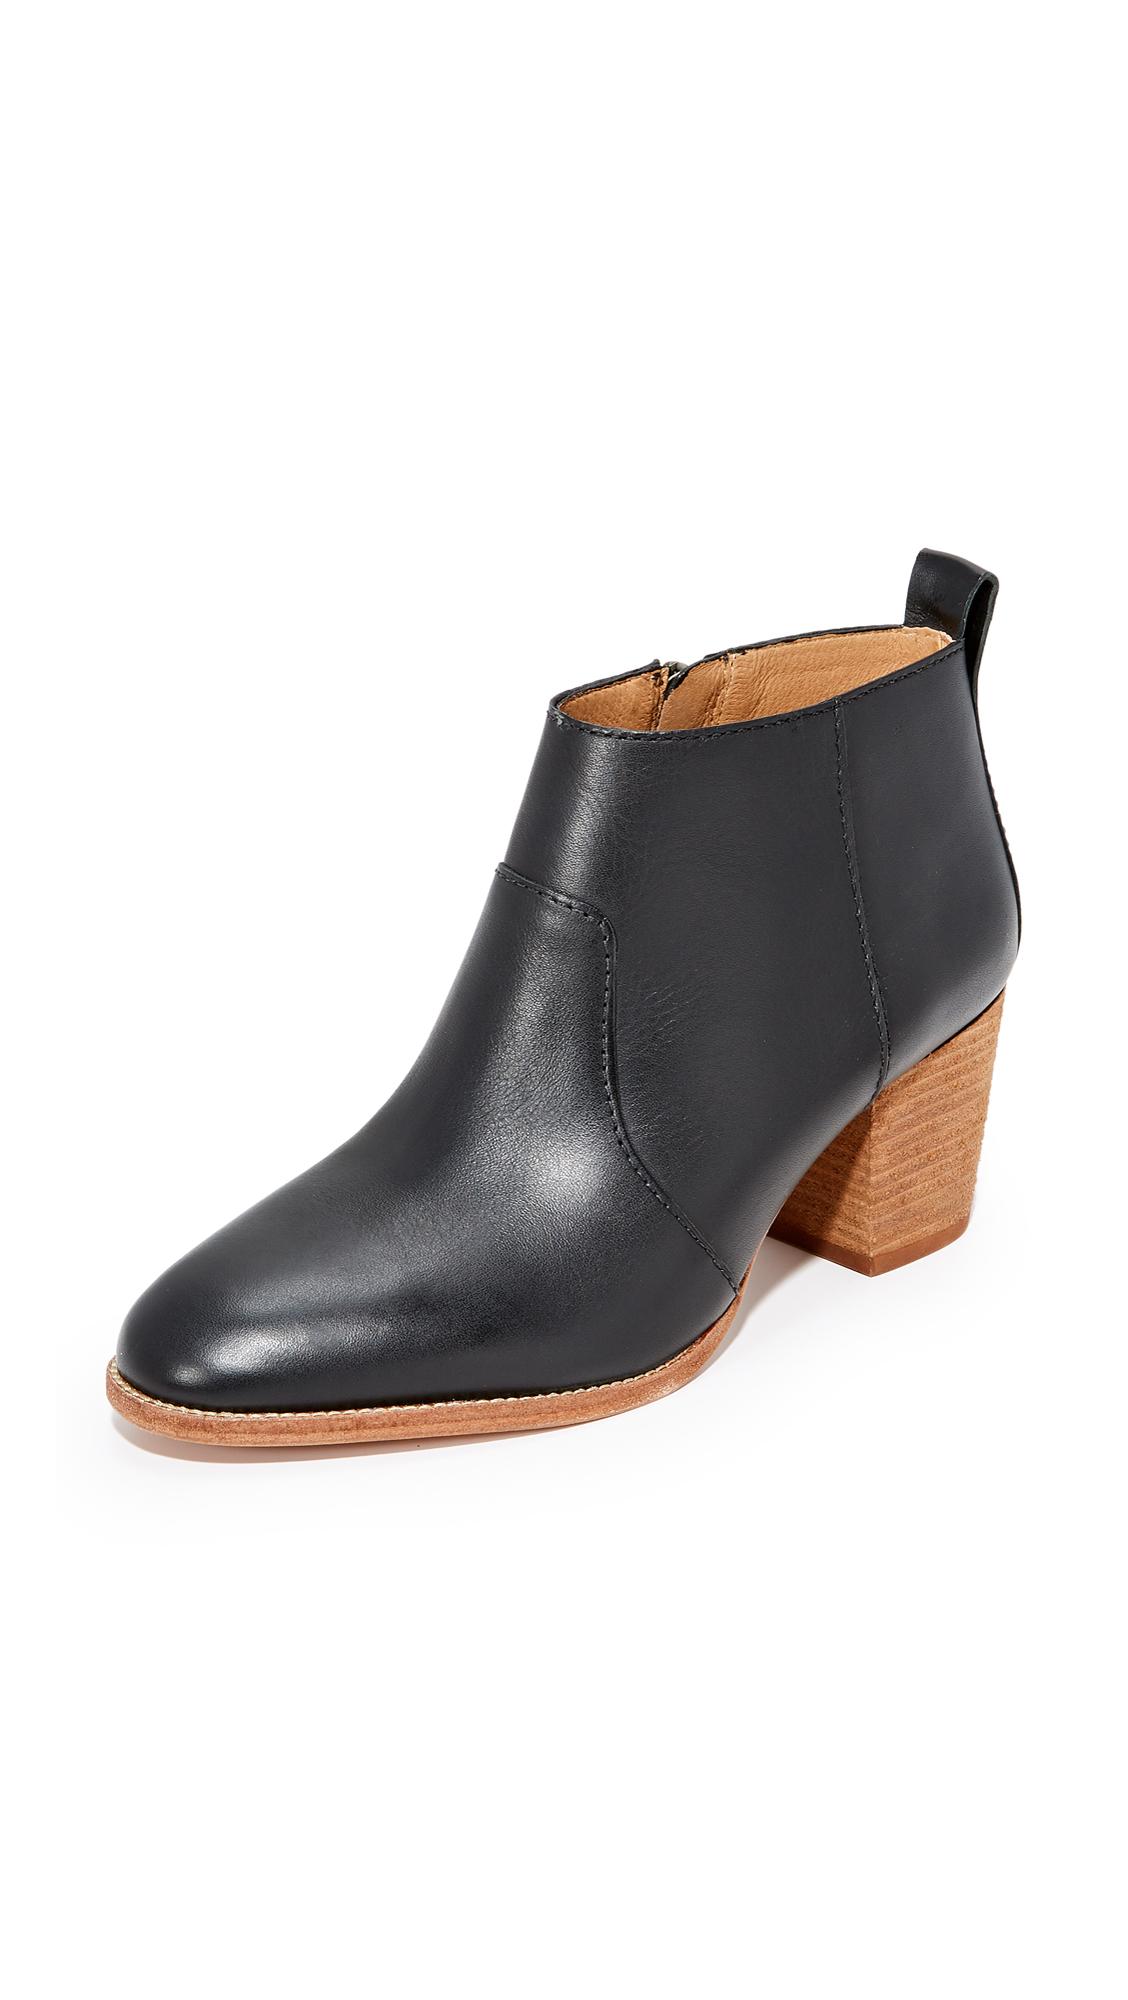 Madewell Brenner Boots - True Black